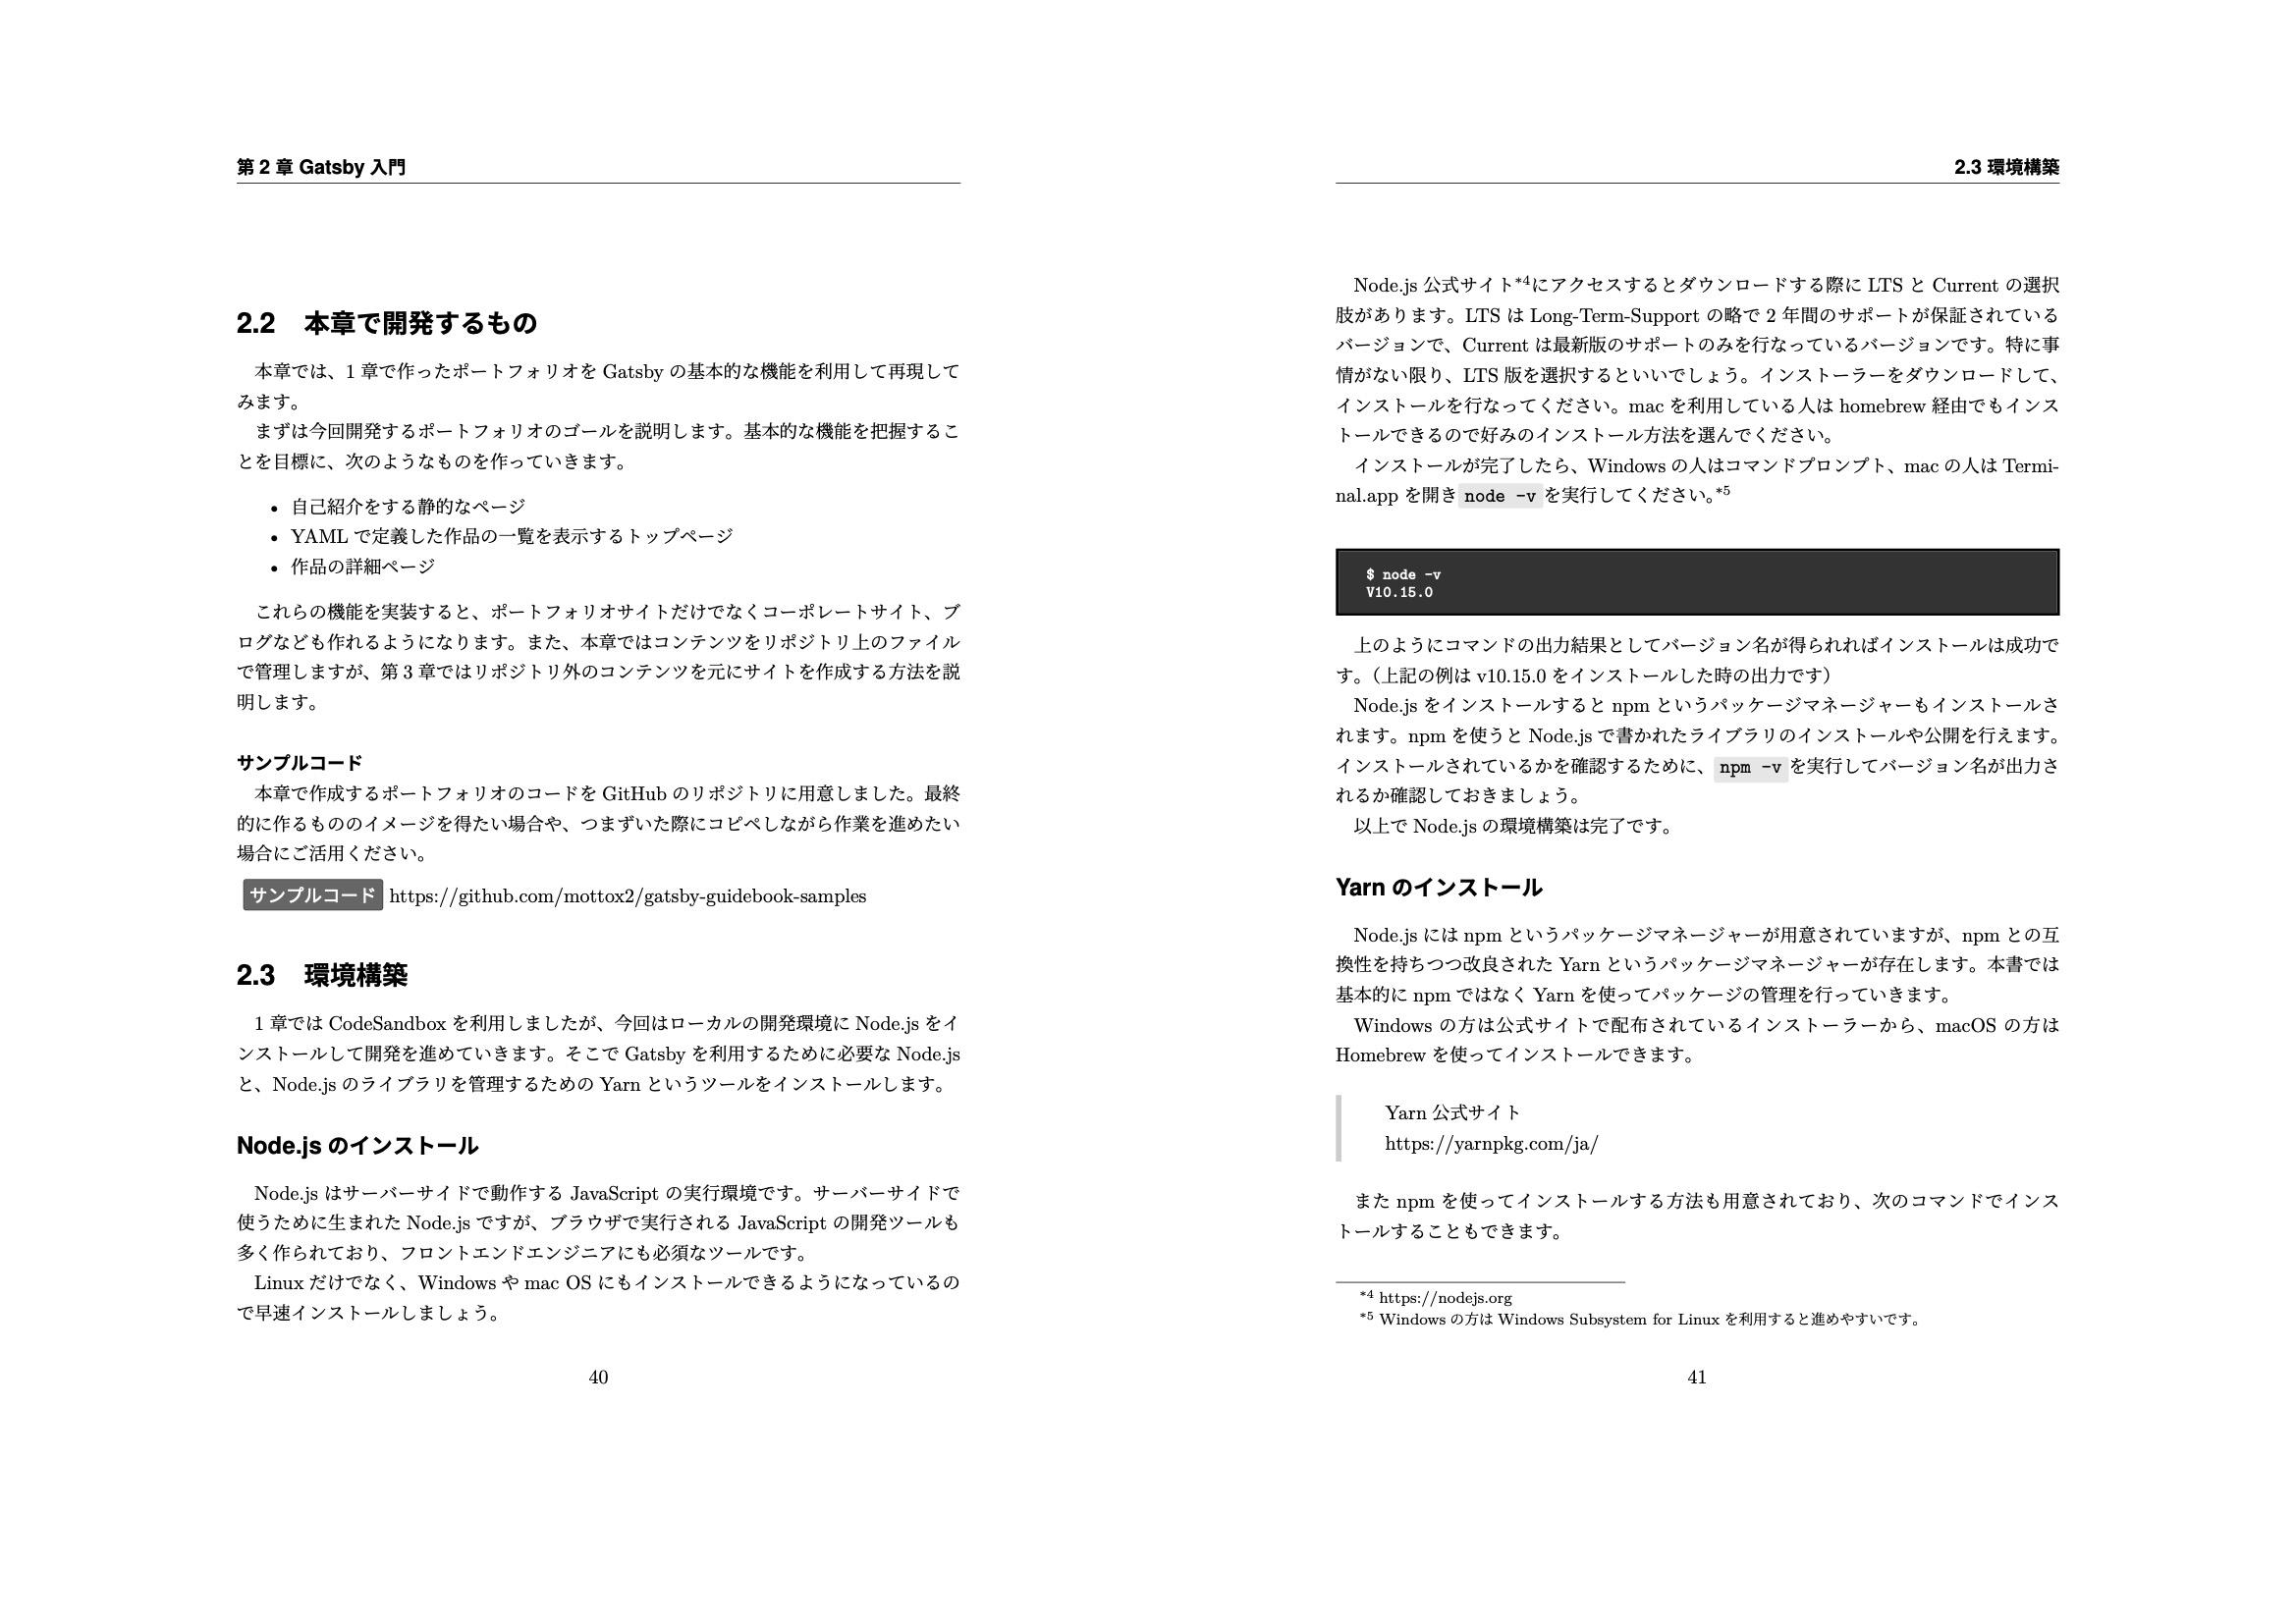 gatsby-guidebook3 20.jpeg (478.2 kB)